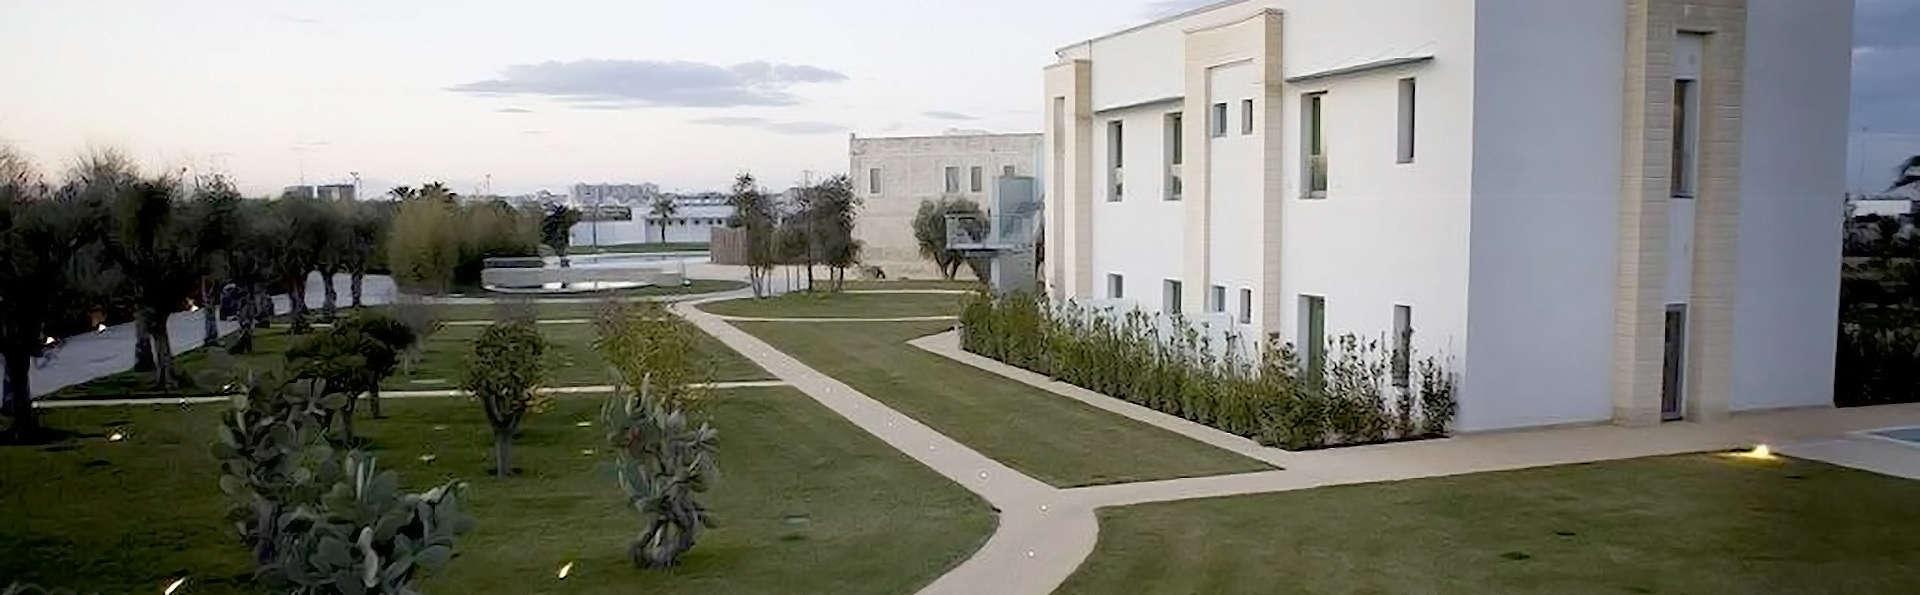 Art Hotel & Park Lecce - Edit_Front.jpg